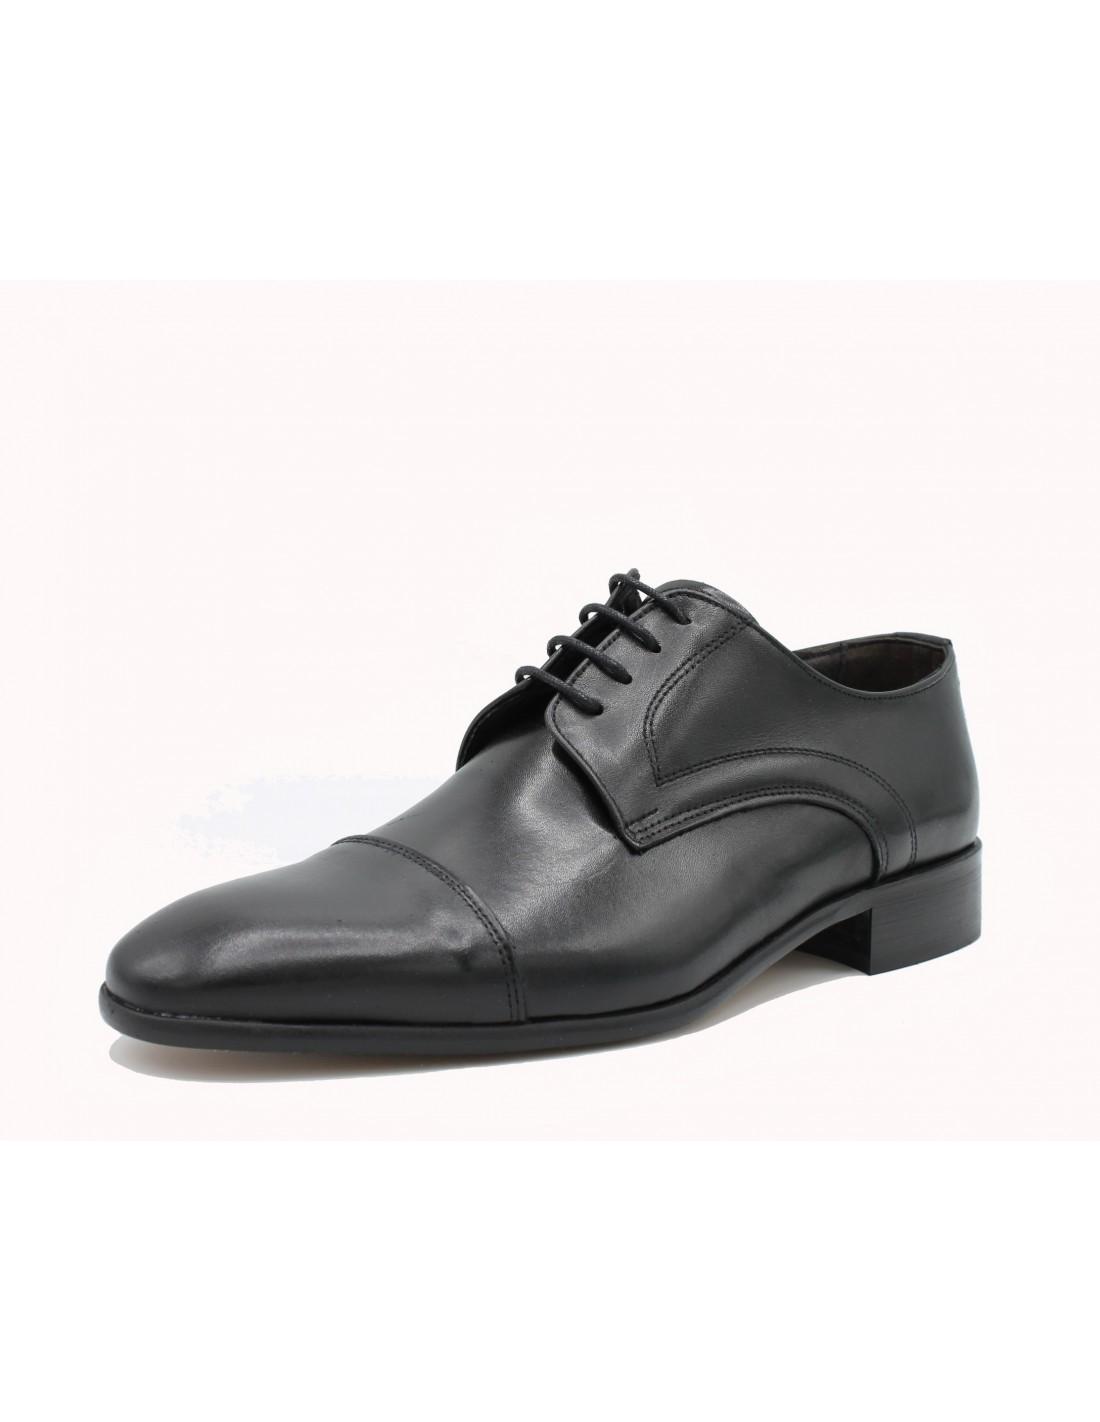 Scarpe da Uomo Classiche in Pelle Eleganti per Cerimonia Made In ... 028e6570cc1